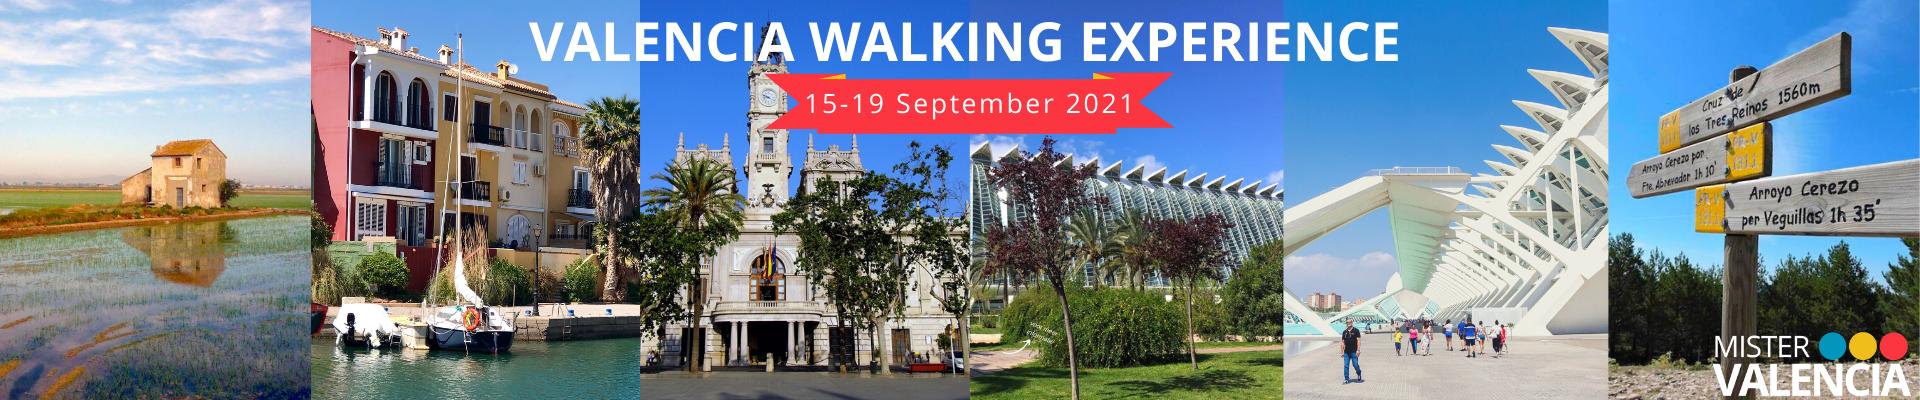 Valencia Walking Experience Sept 2021